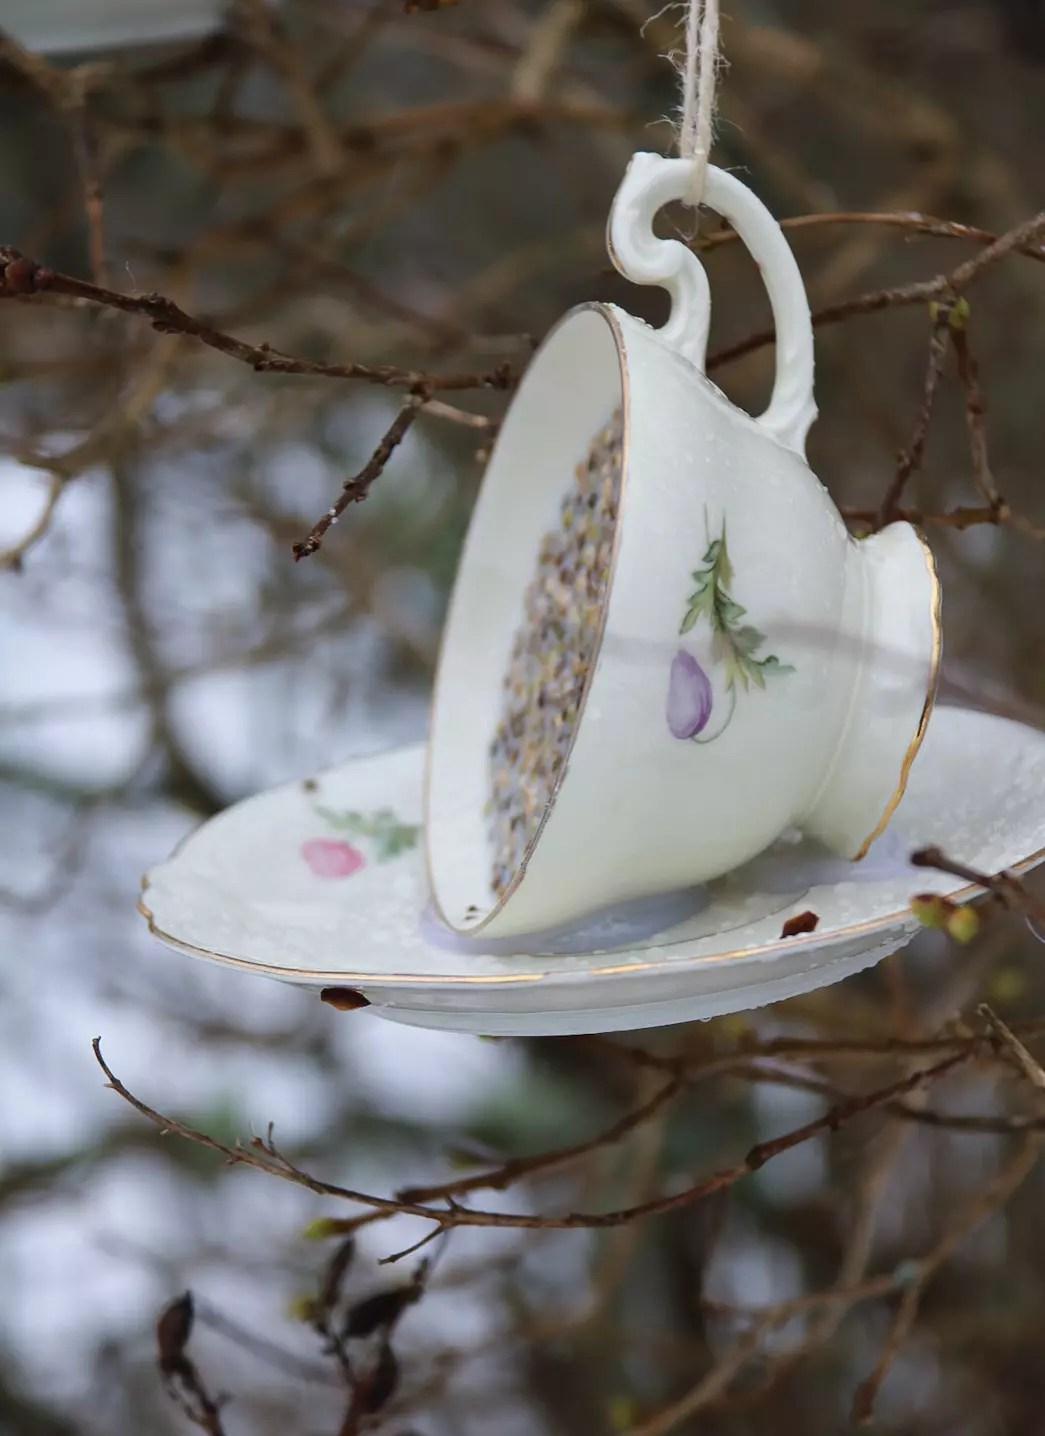 Fågelmatare av kaffekopp